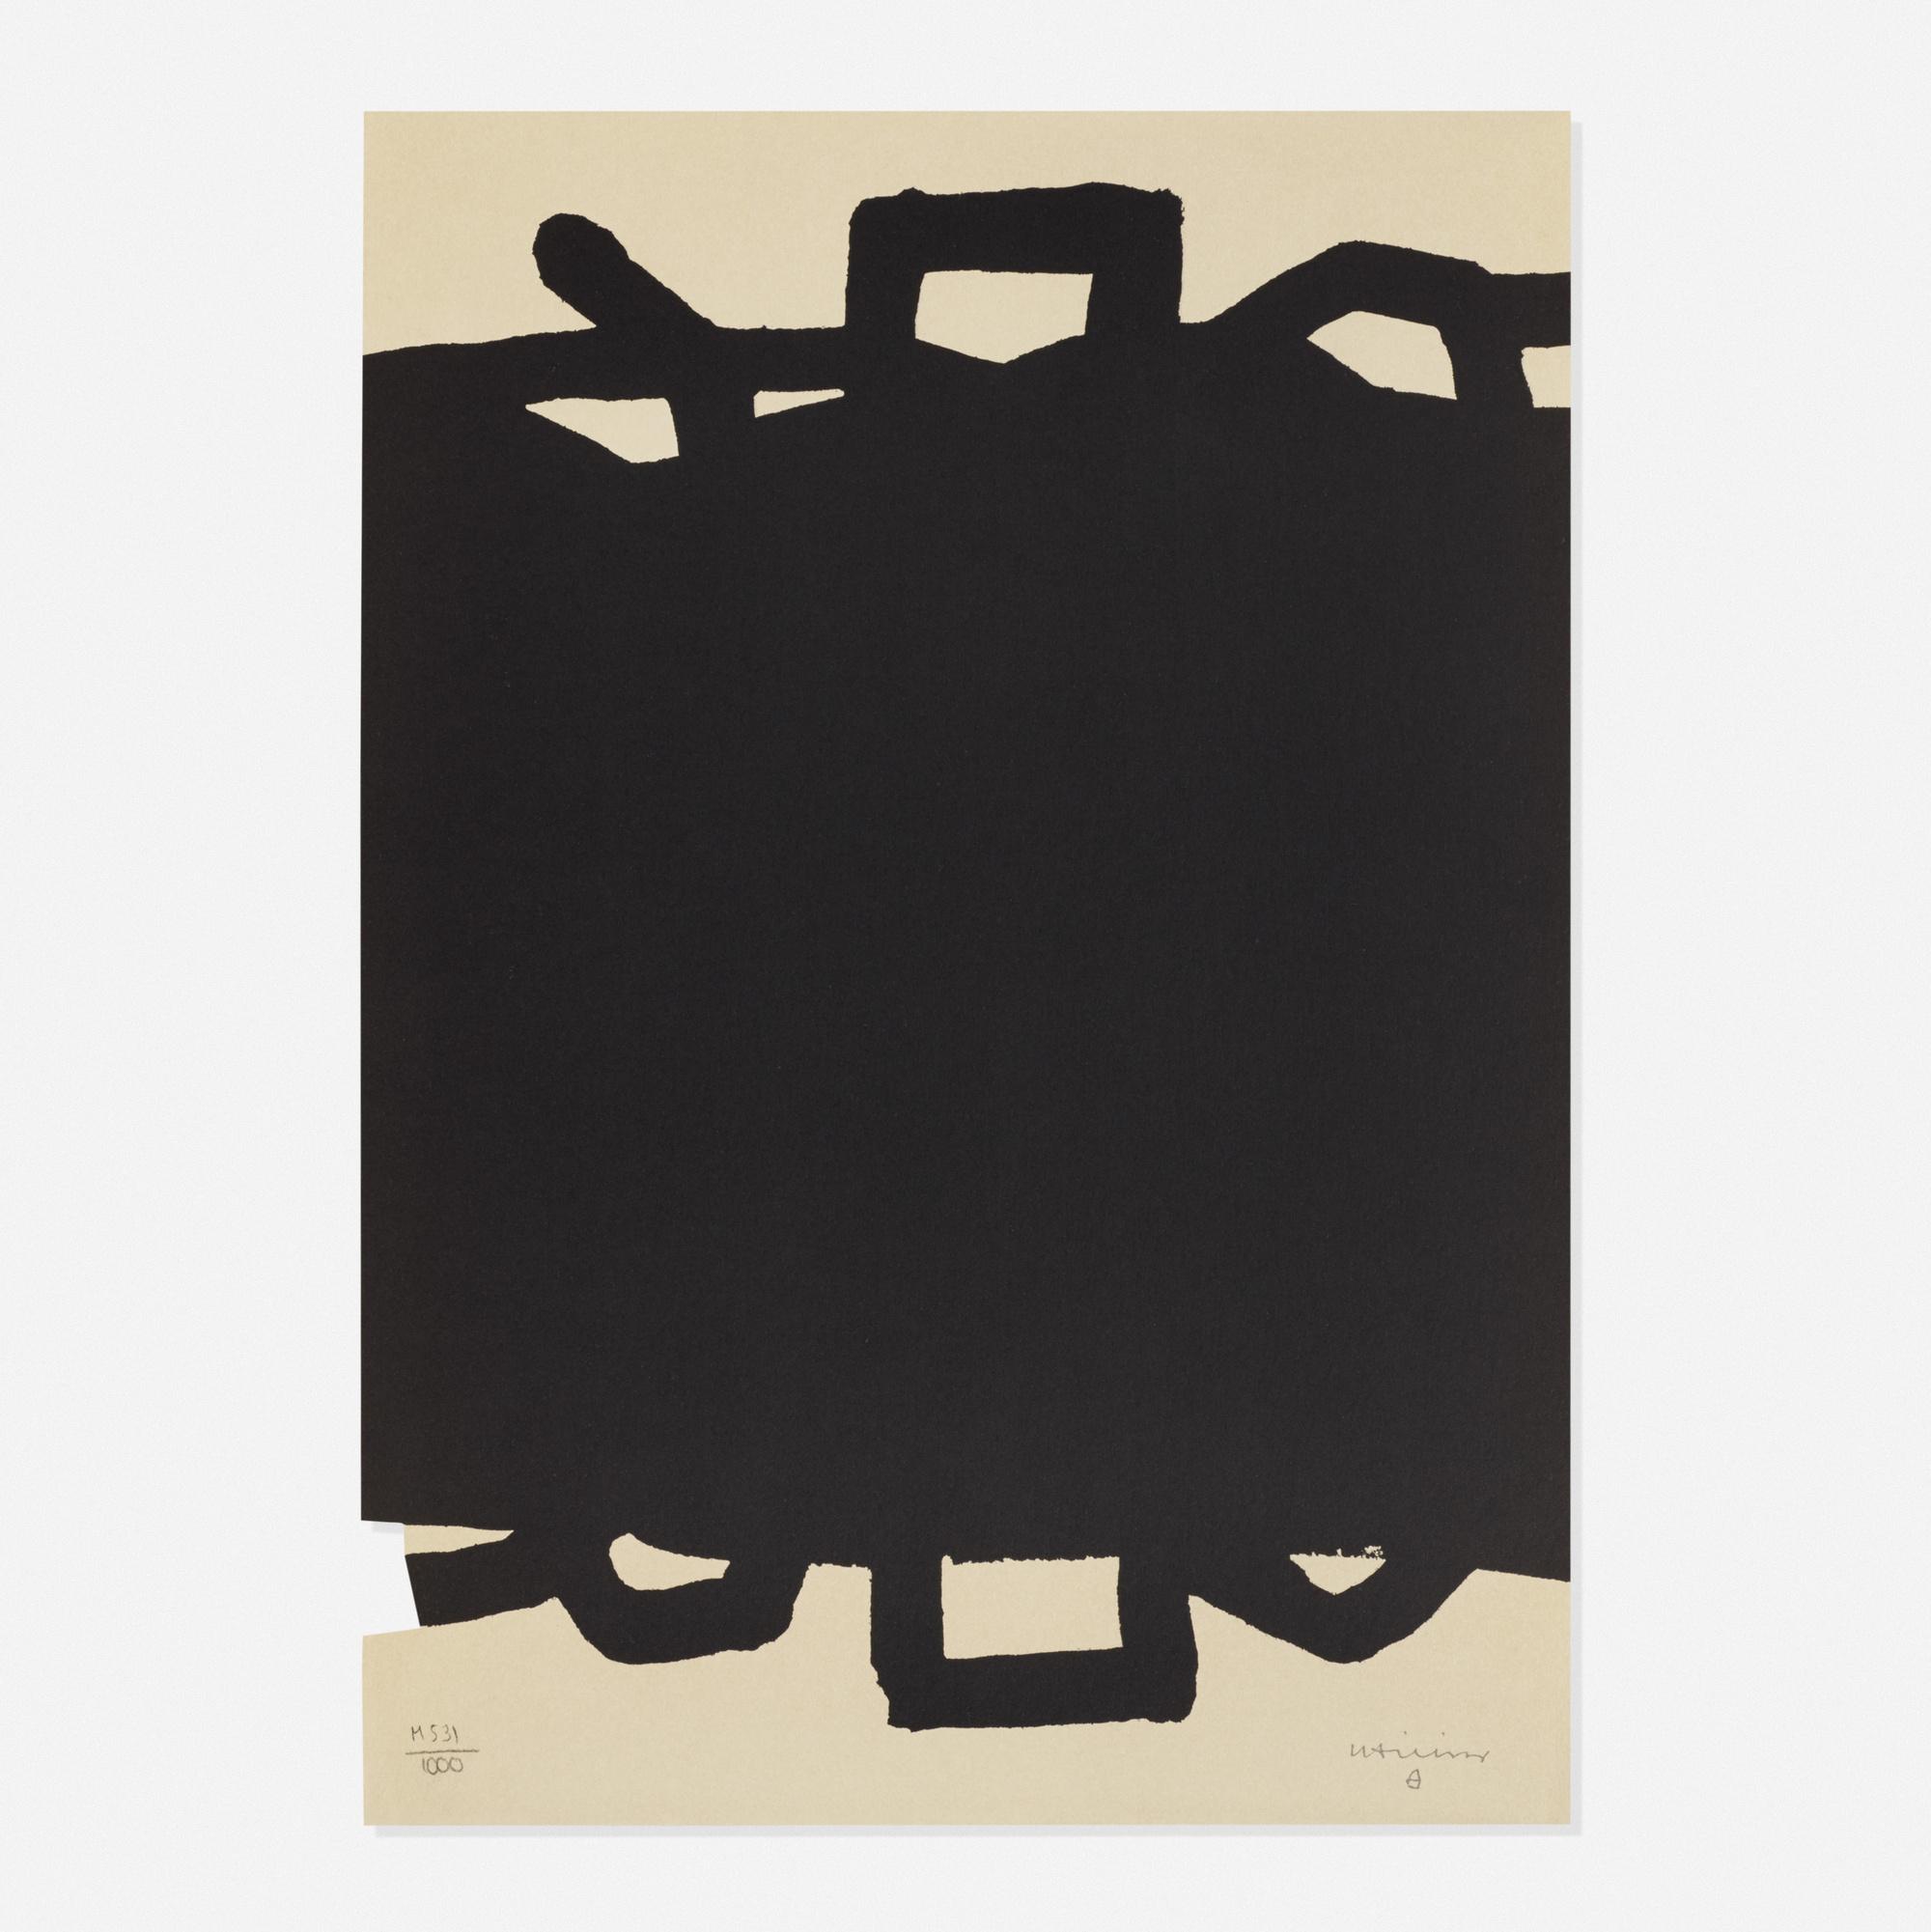 203: Eduardo Chillida / Untitled (1 of 1)